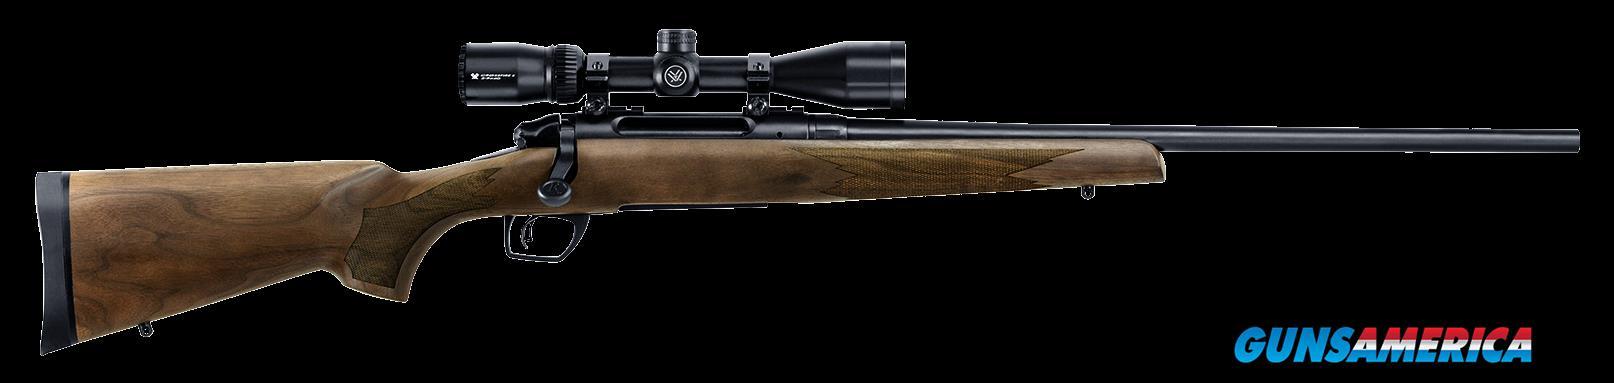 Remington Firearms 783, Rem 85894 783 W-vortex 300 Mg   24 Wal  Guns > Pistols > 1911 Pistol Copies (non-Colt)